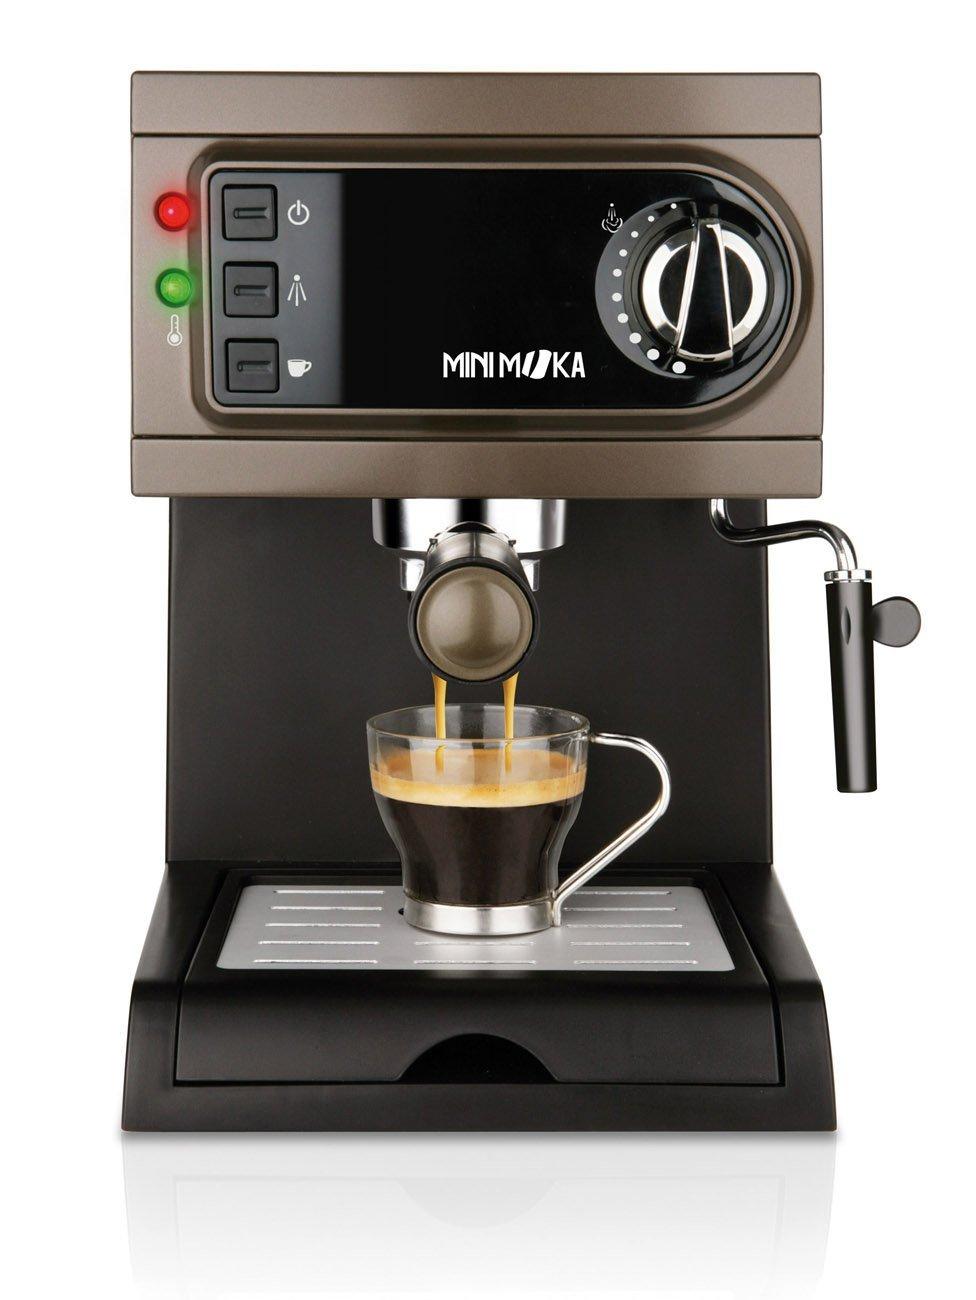 Mejor cafetera express en comprar cafetera express - Mejor cafetera express para casa ...